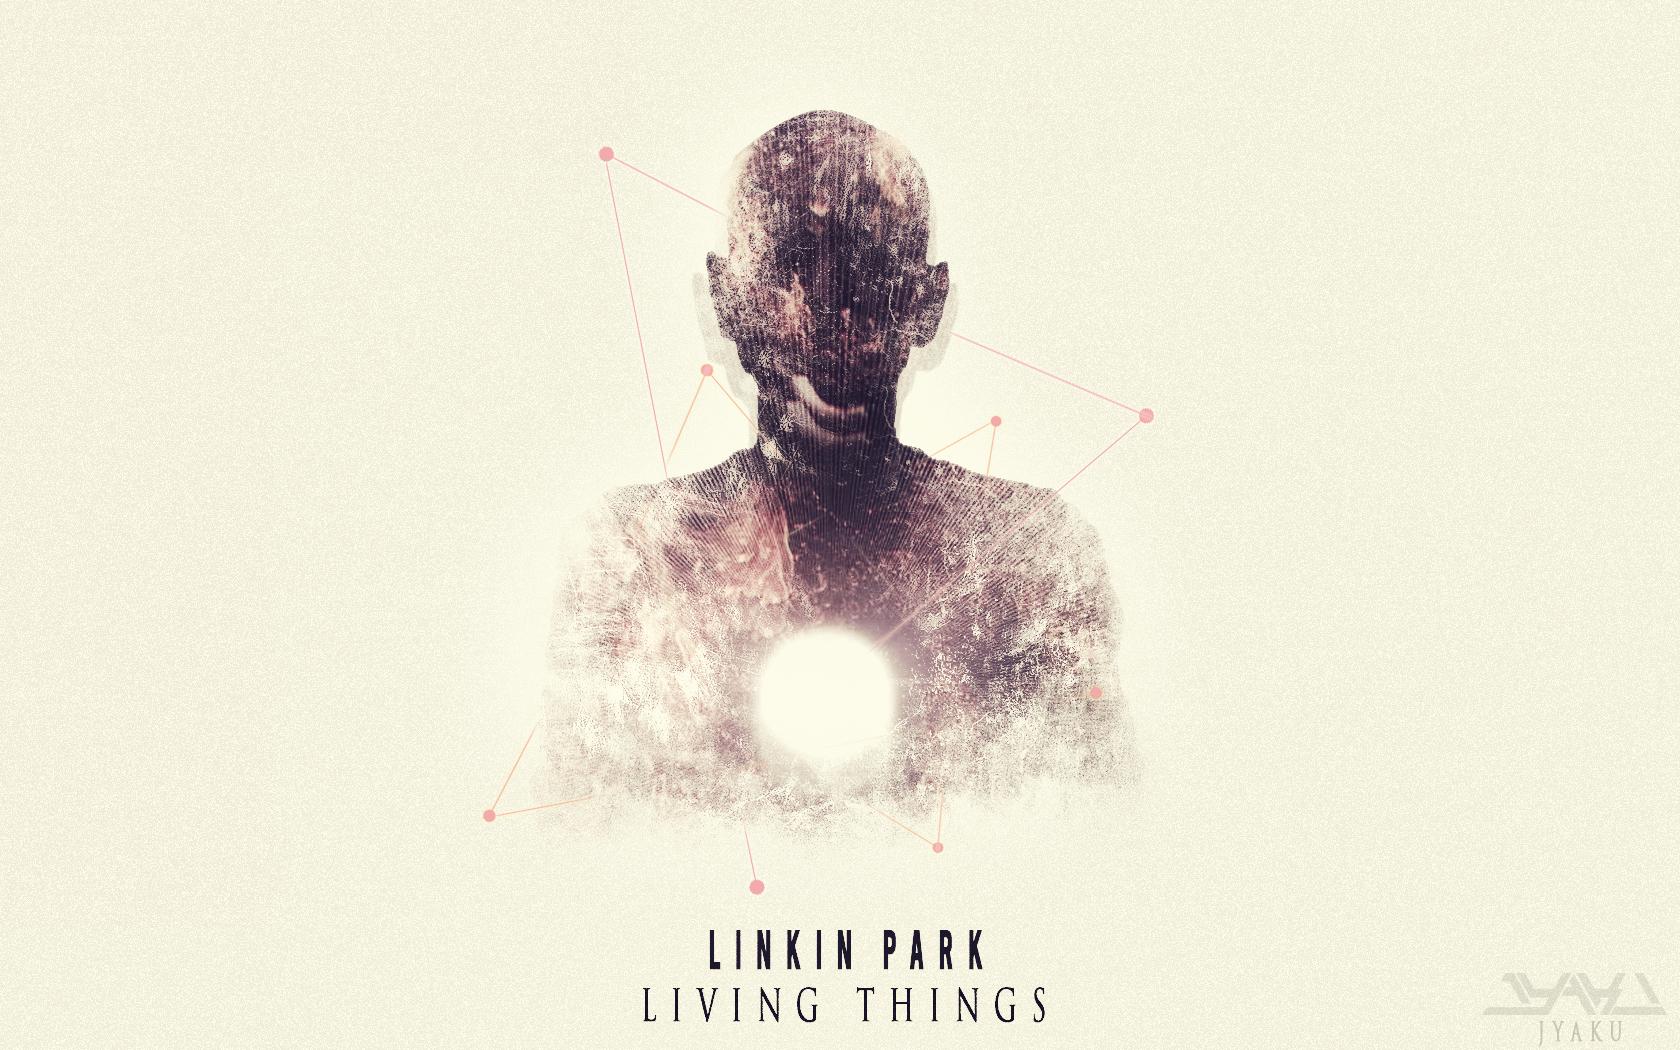 Linkin Park Living Things Wallpaper By Jyakudesigns On Deviantart